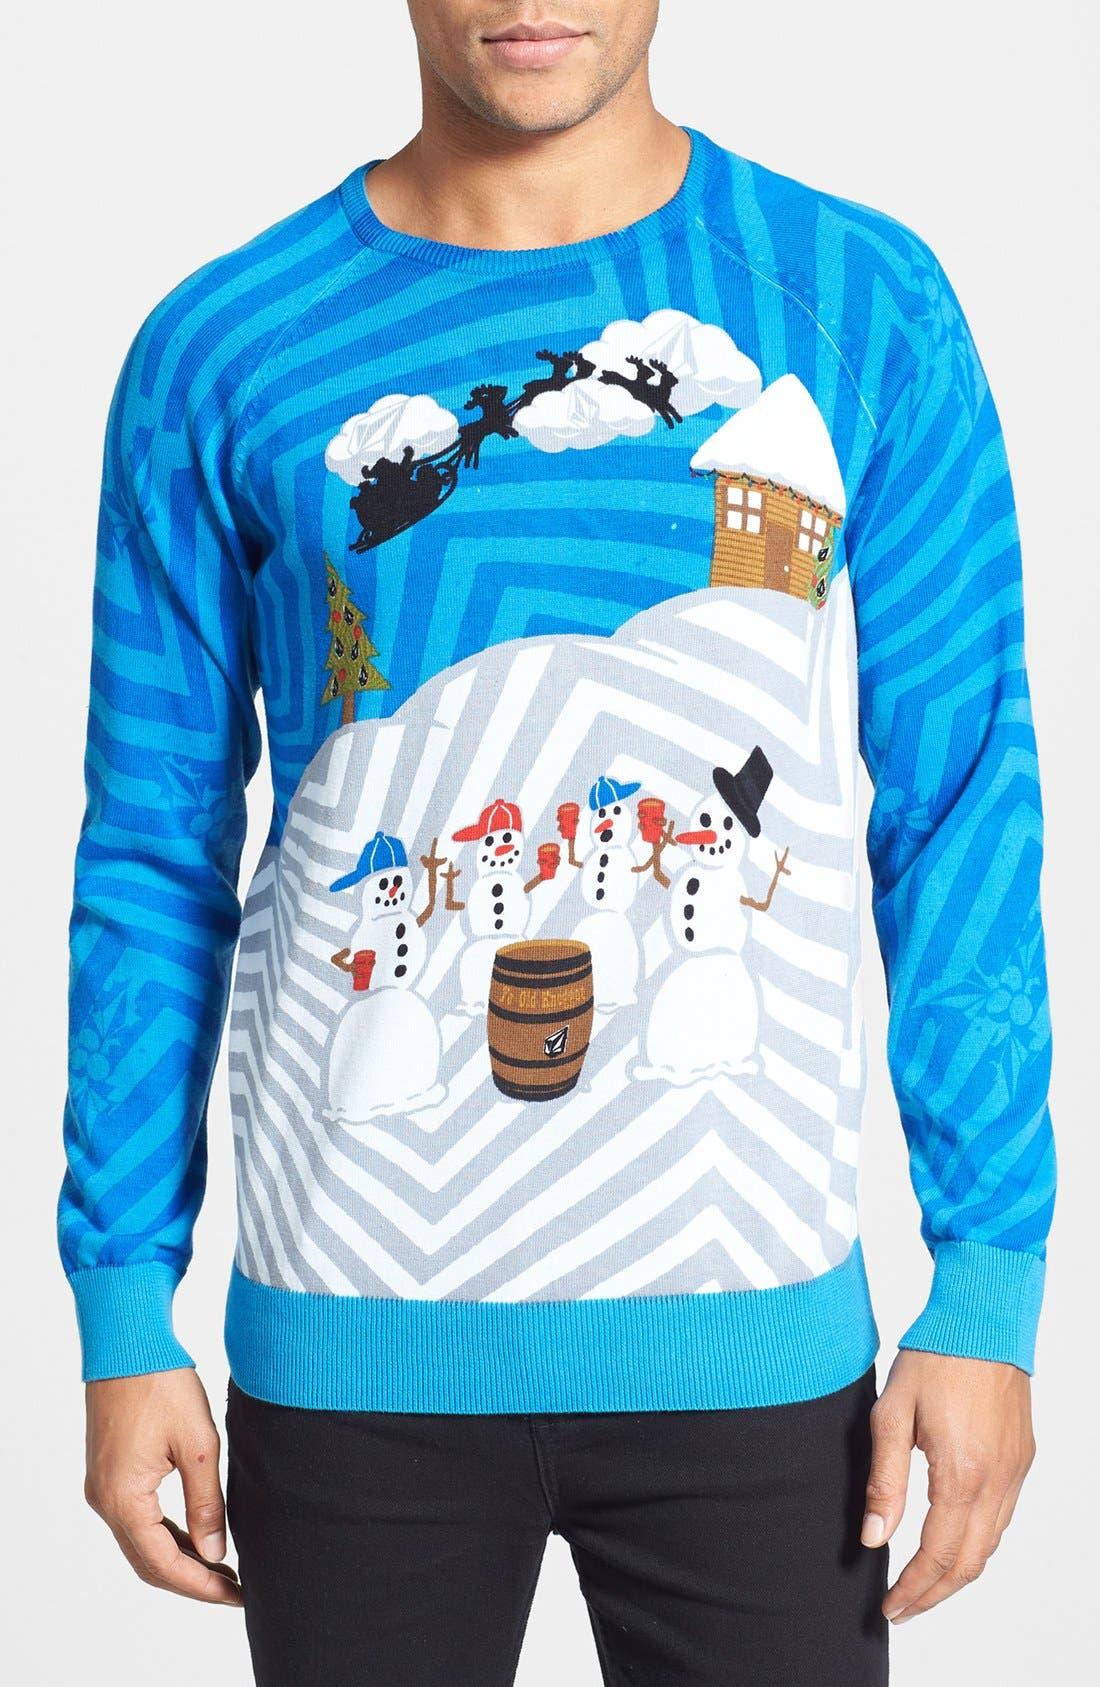 Alternate Image 1 Selected - Volcom 'Knogger' Print Crewneck Sweater